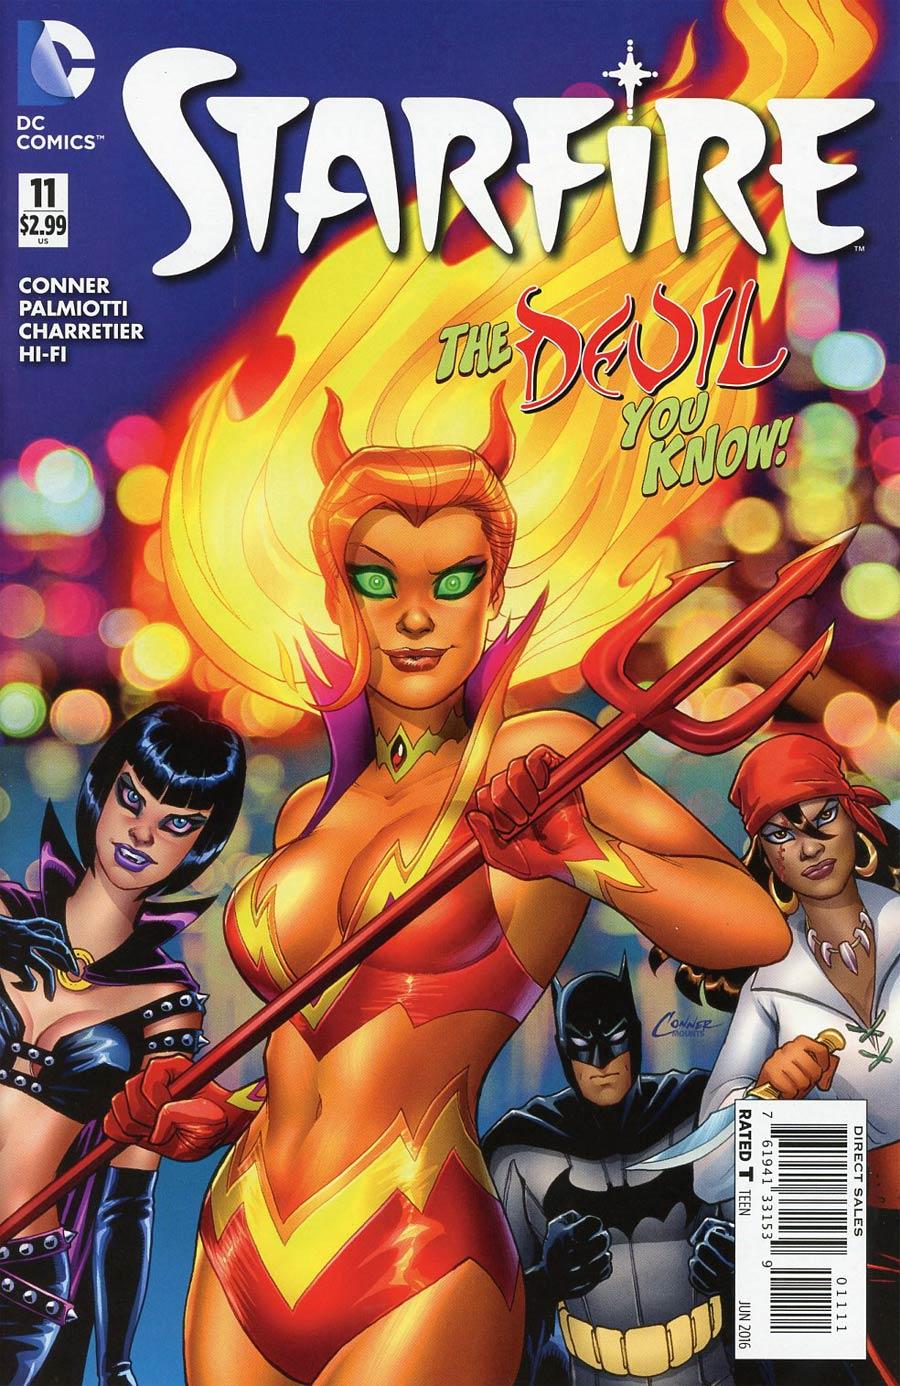 Starfire Vol 2 #11 Cover A Regular Amanda Conner Cover